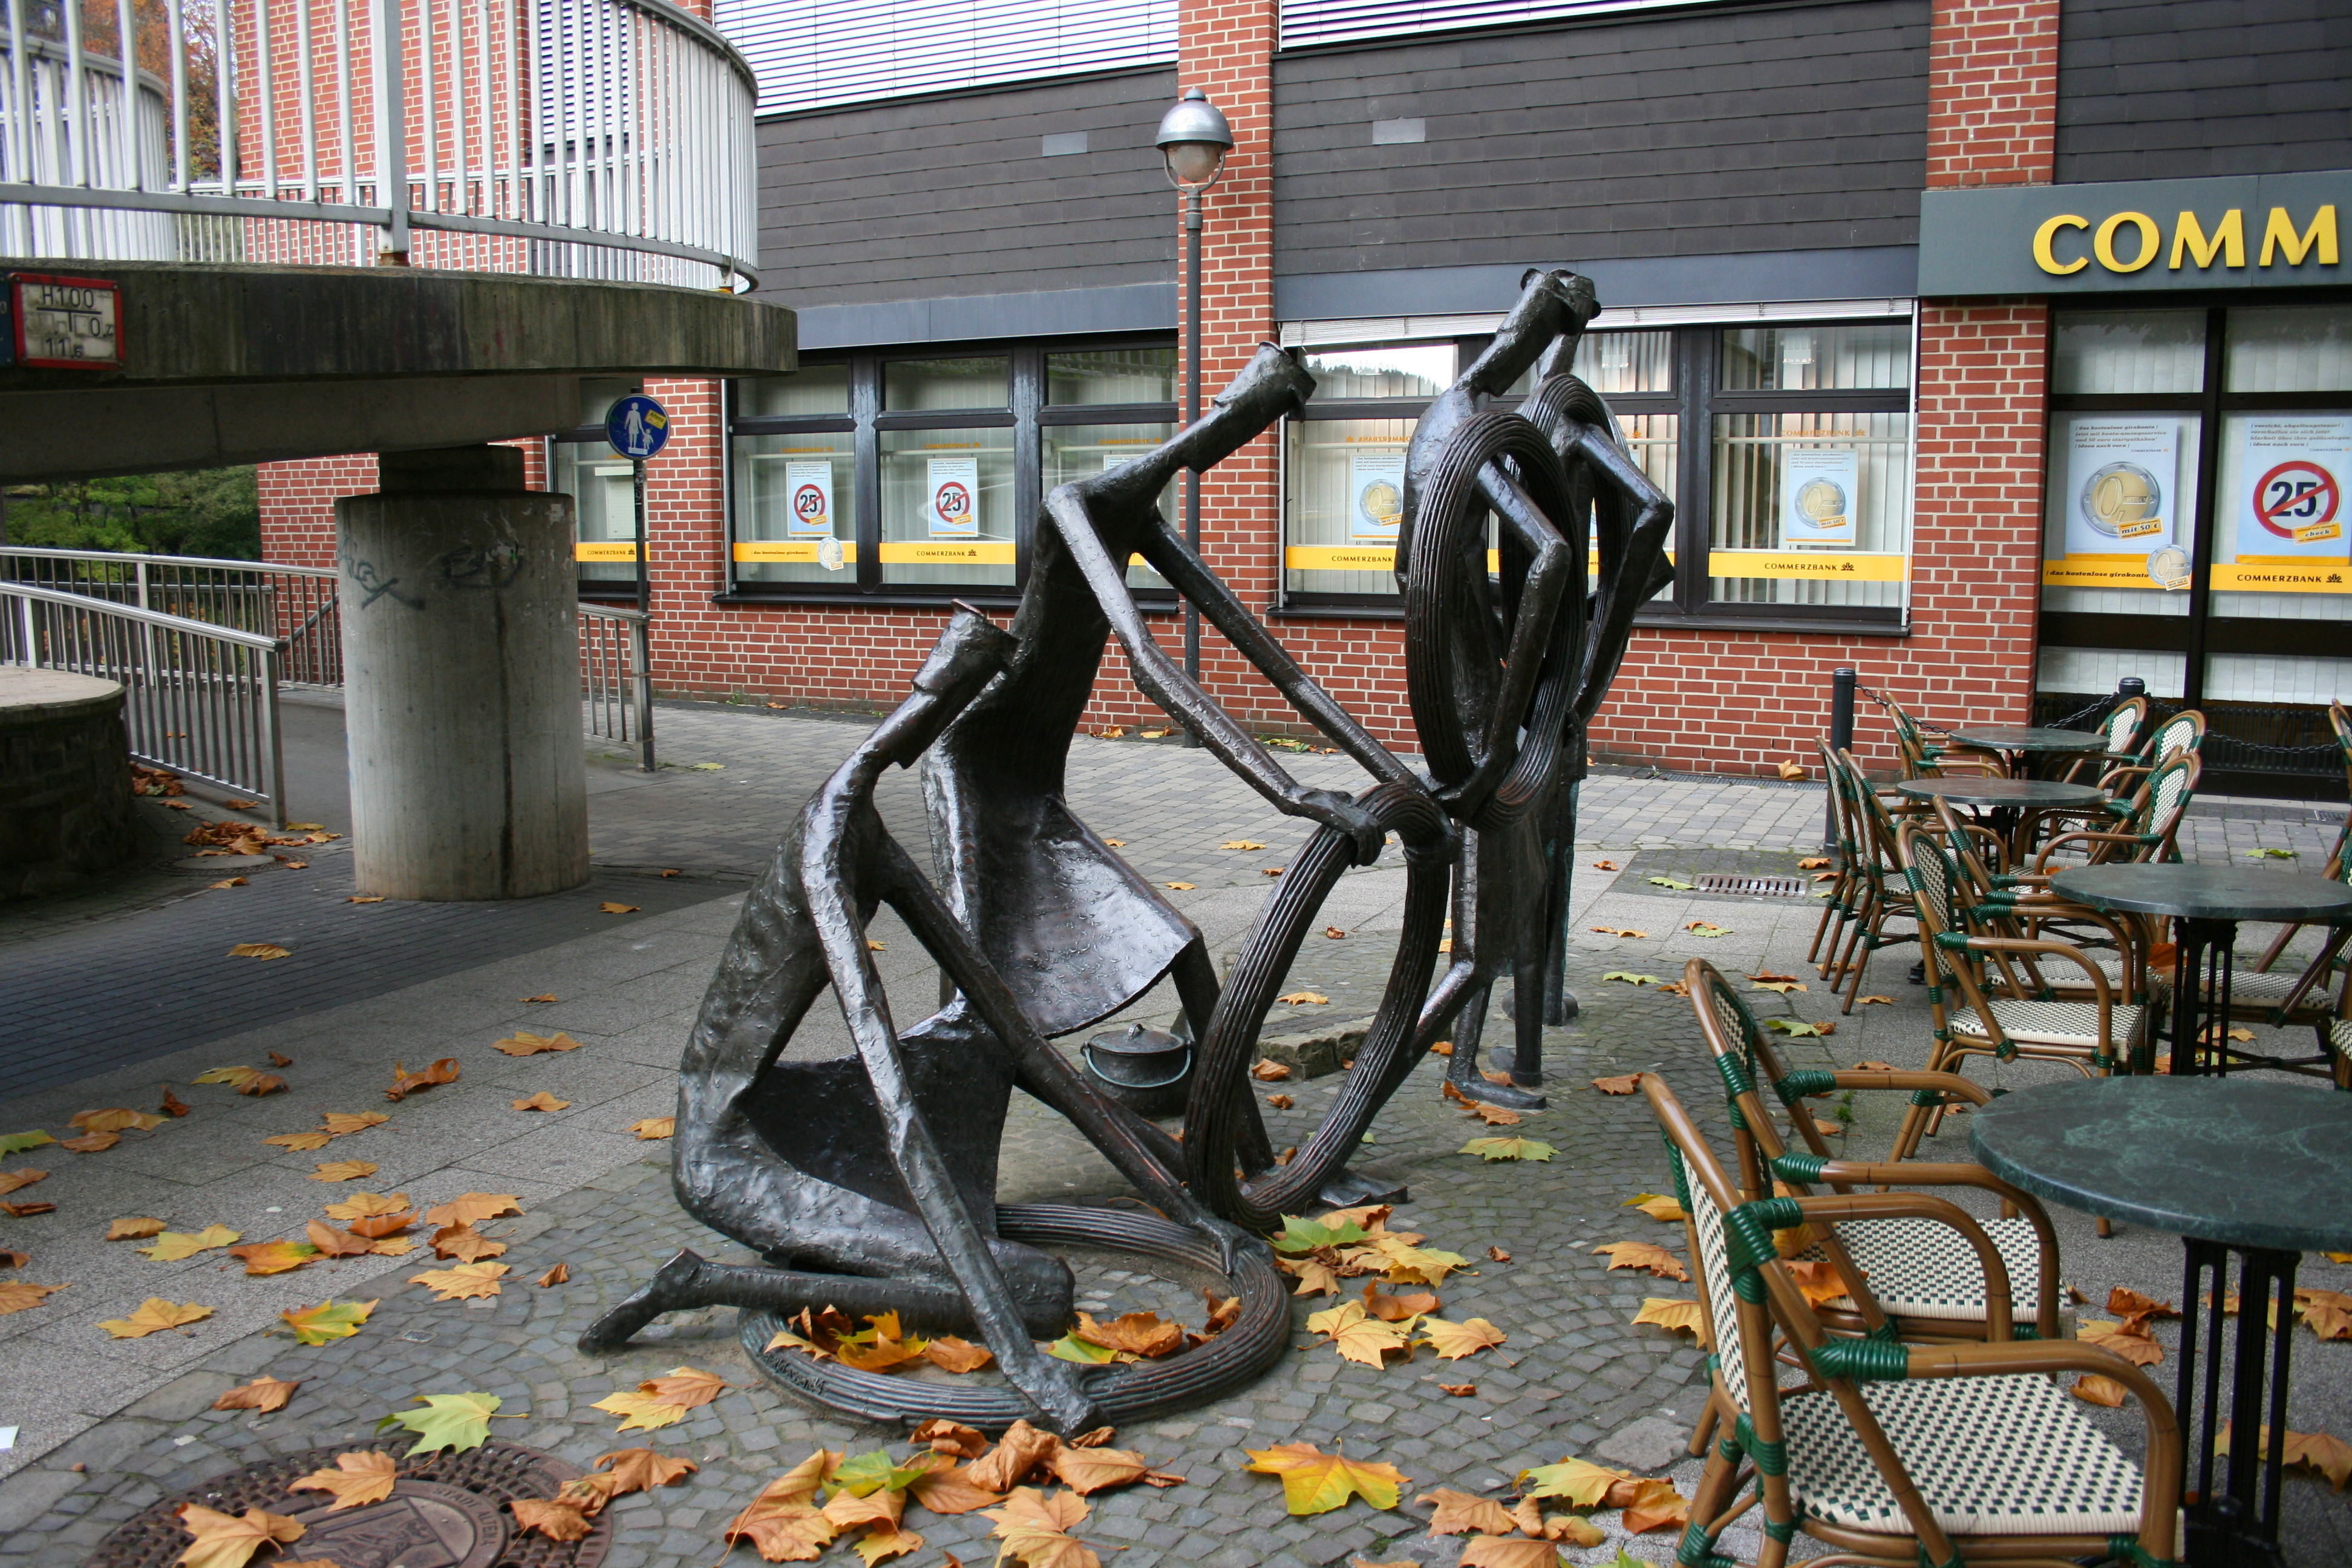 File:Altena - Jägerplatz - Drahtzieher 02 ies.jpg - Wikimedia Commons